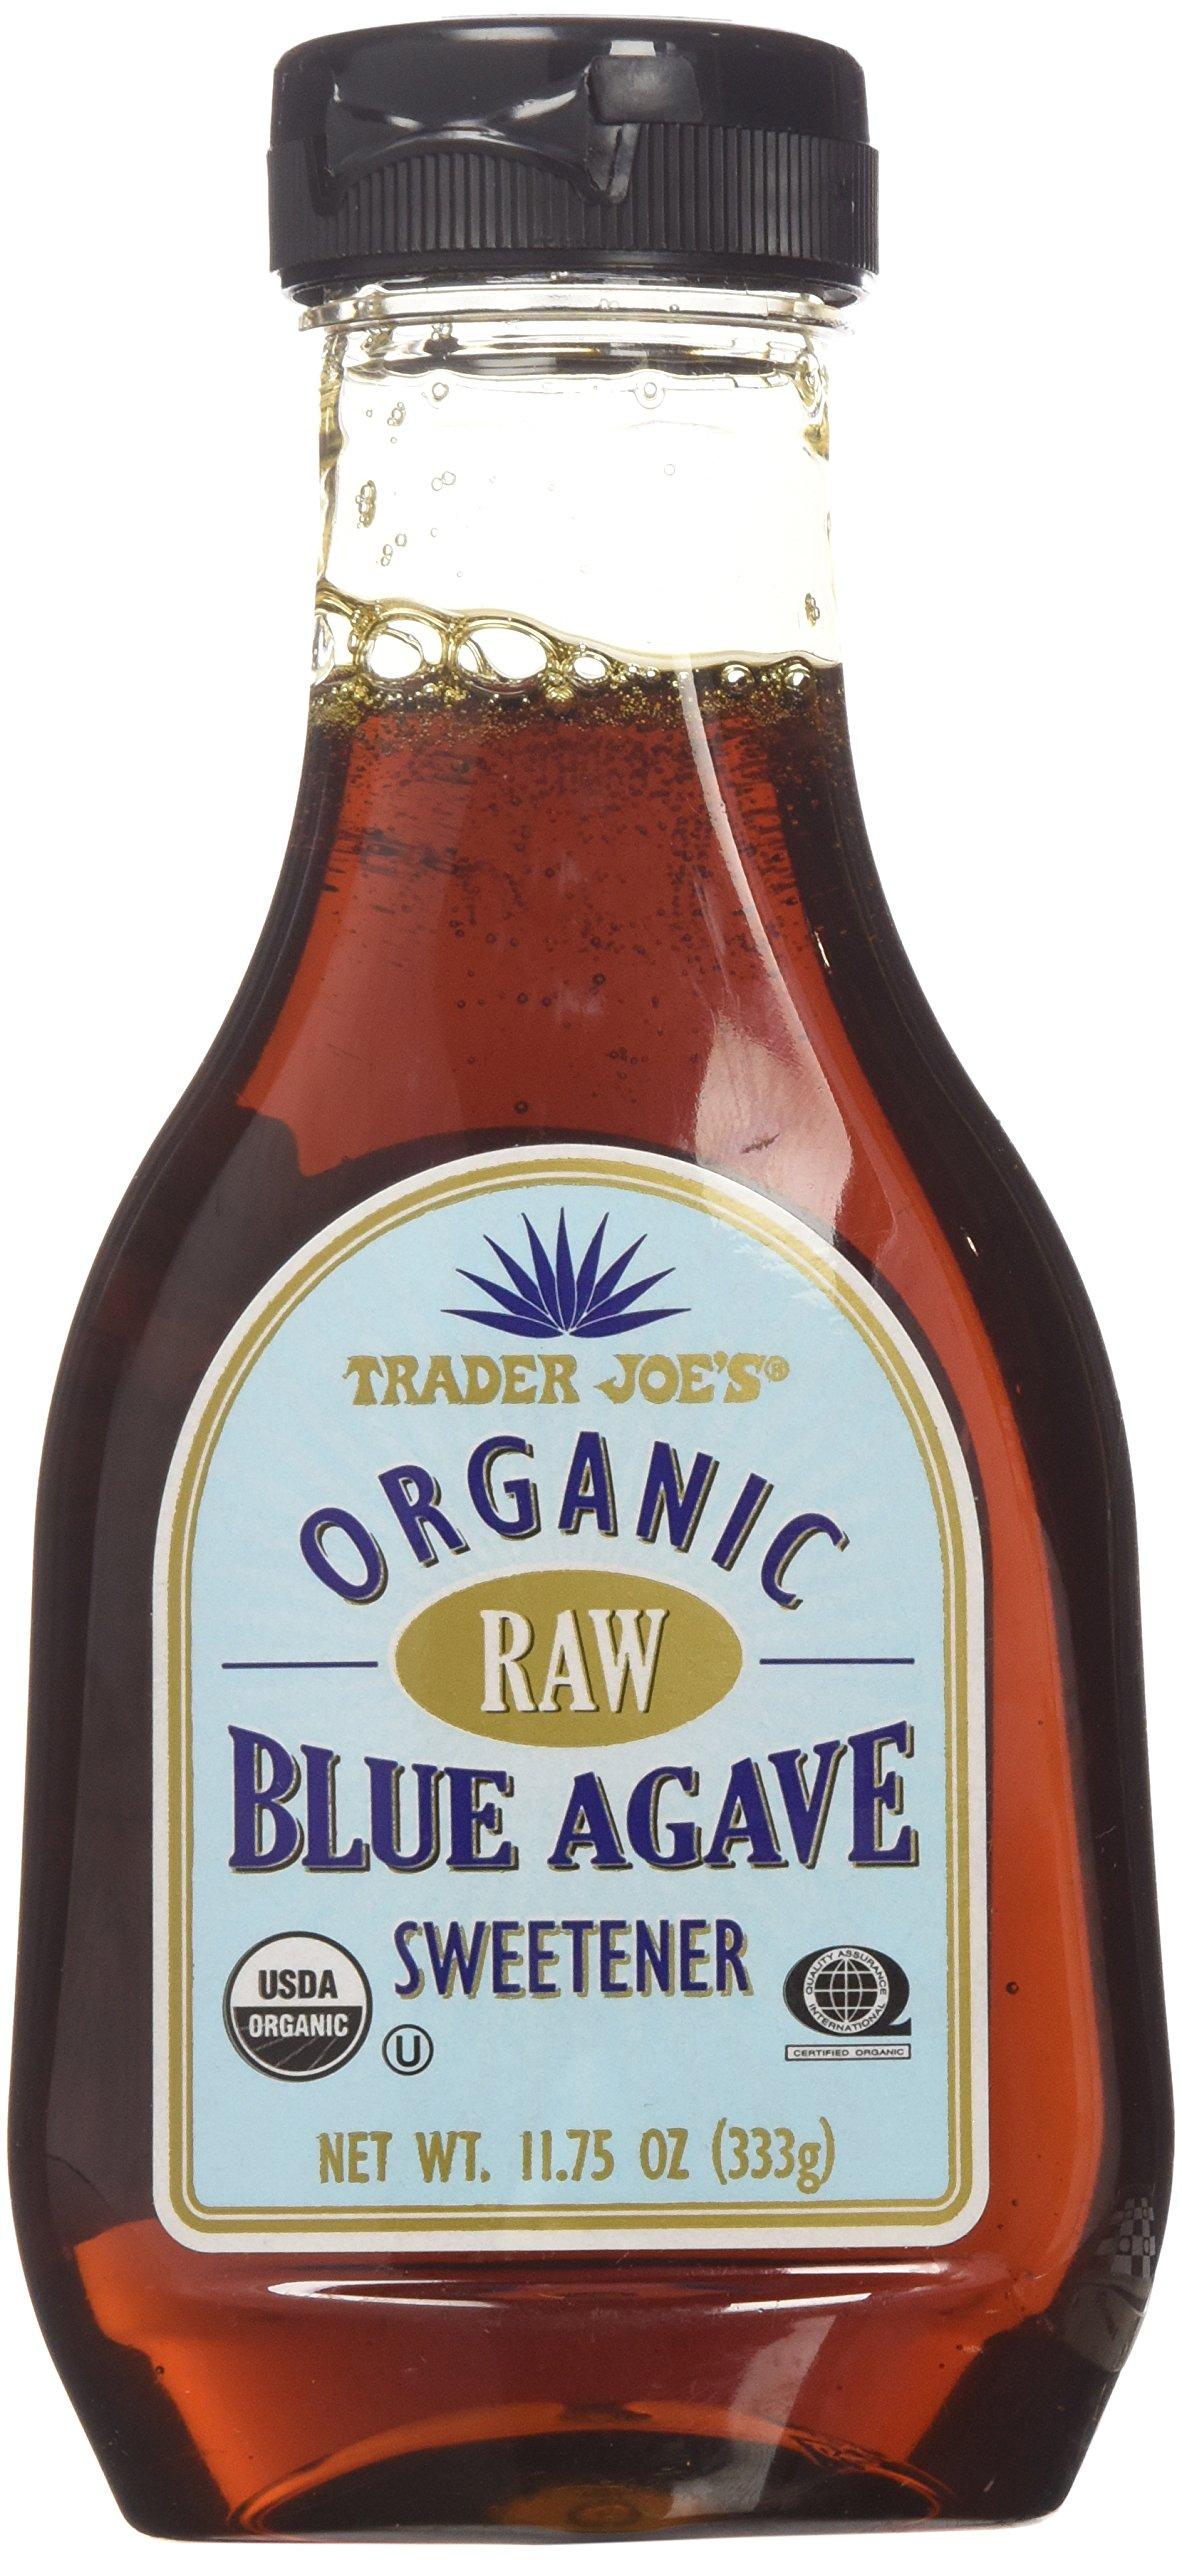 Trader Joe's Organic Raw Blue Agave Sweetener 11.75 Oz.